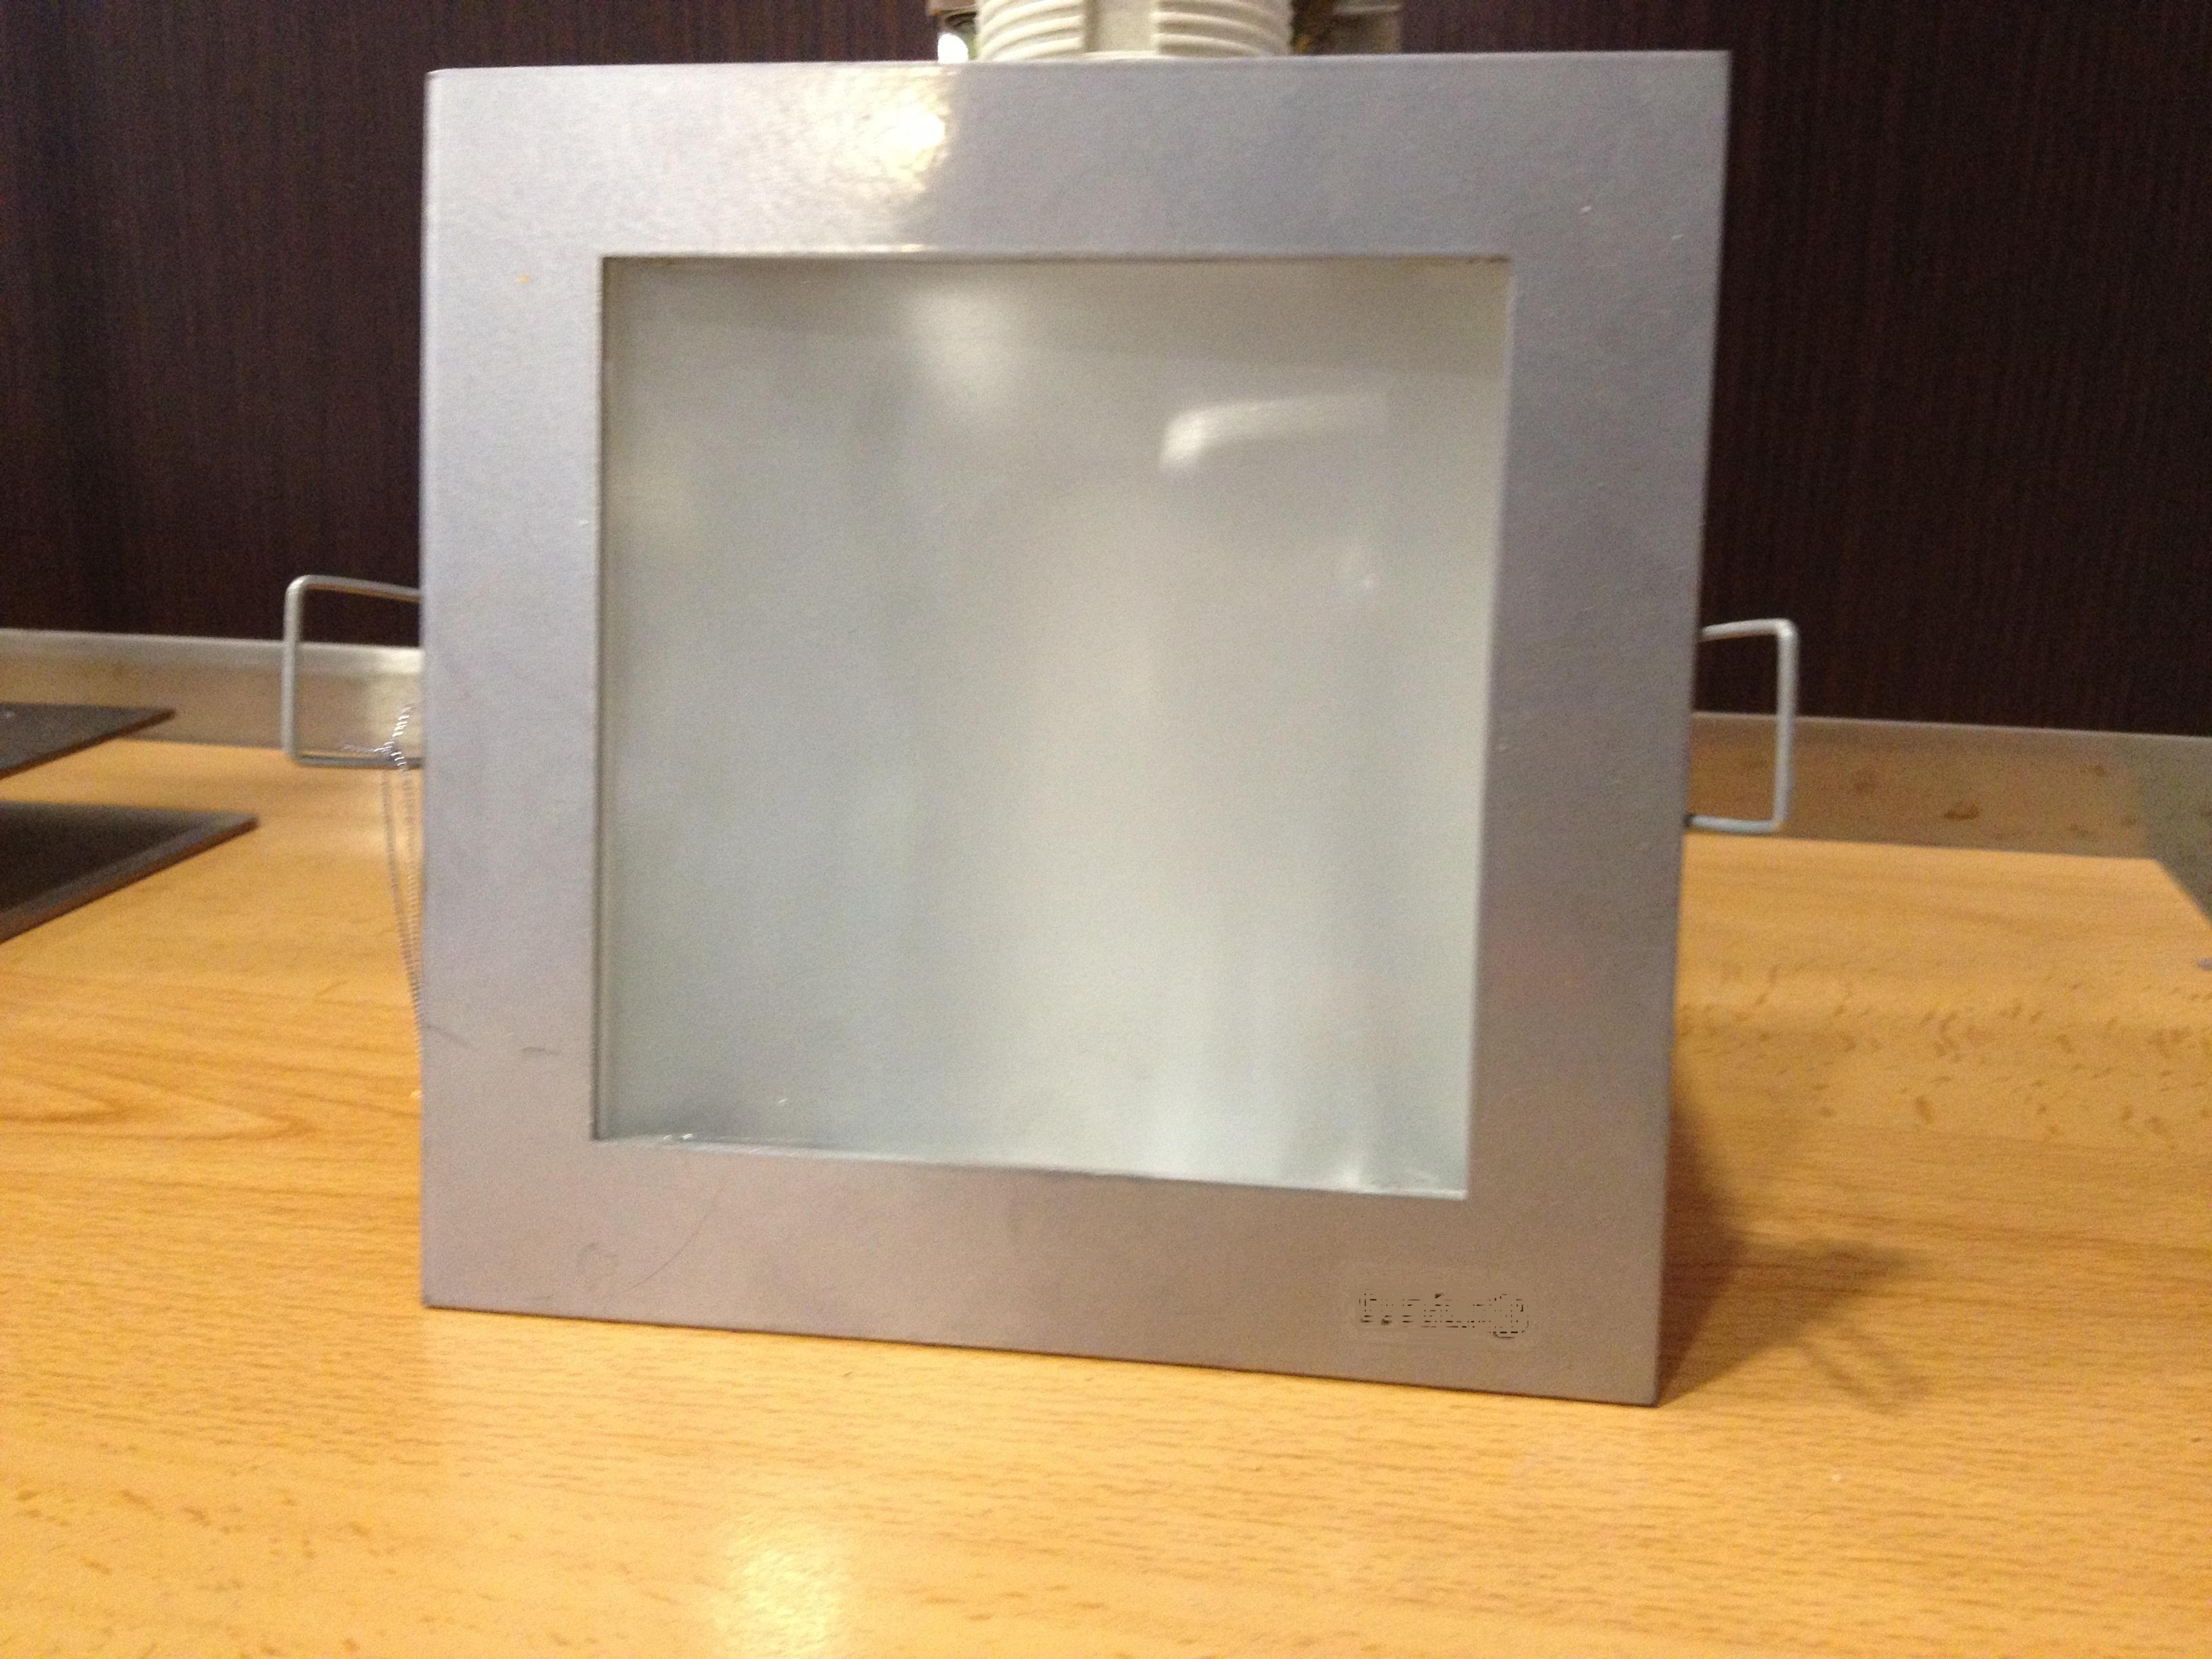 Projector fl. comp. 1x18w cz/fosco c/lamp. 7061.118.2fl